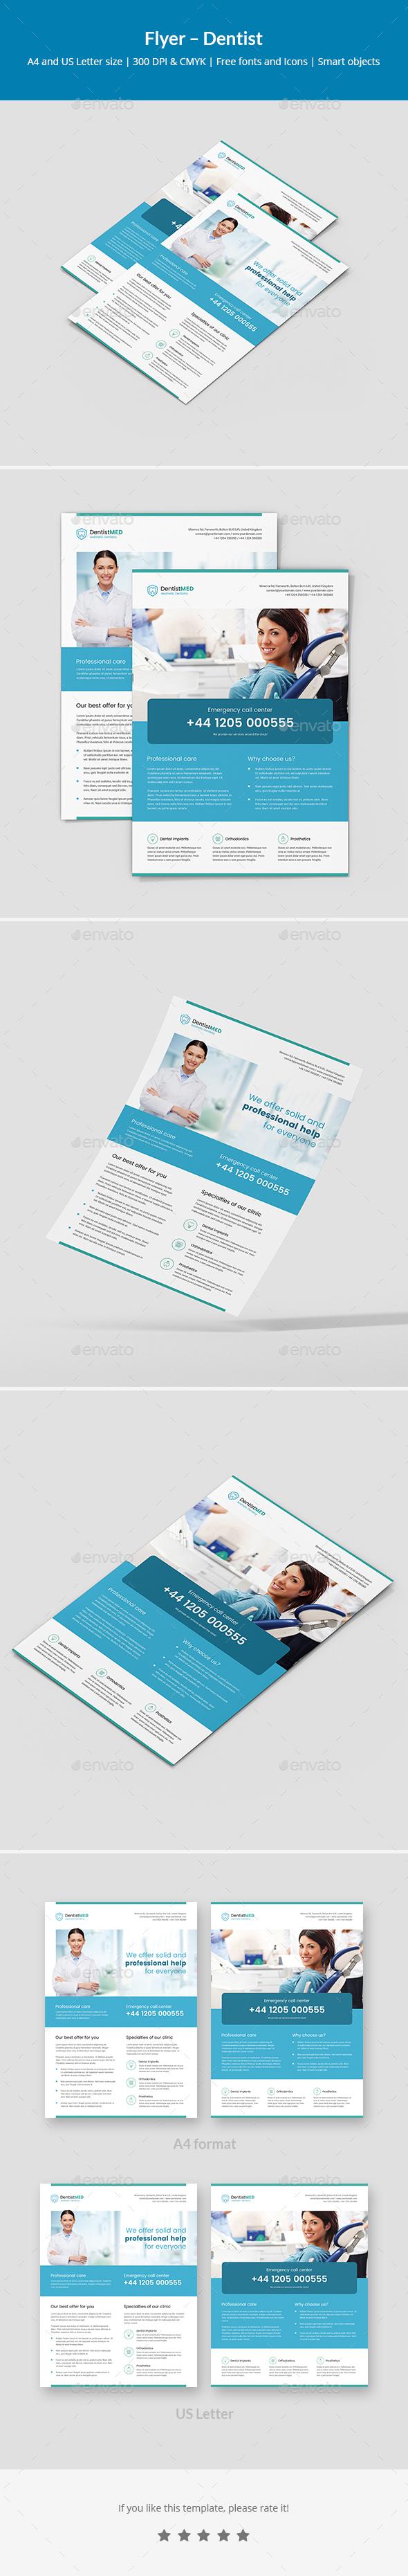 Flyer – Dentist - Corporate Flyers